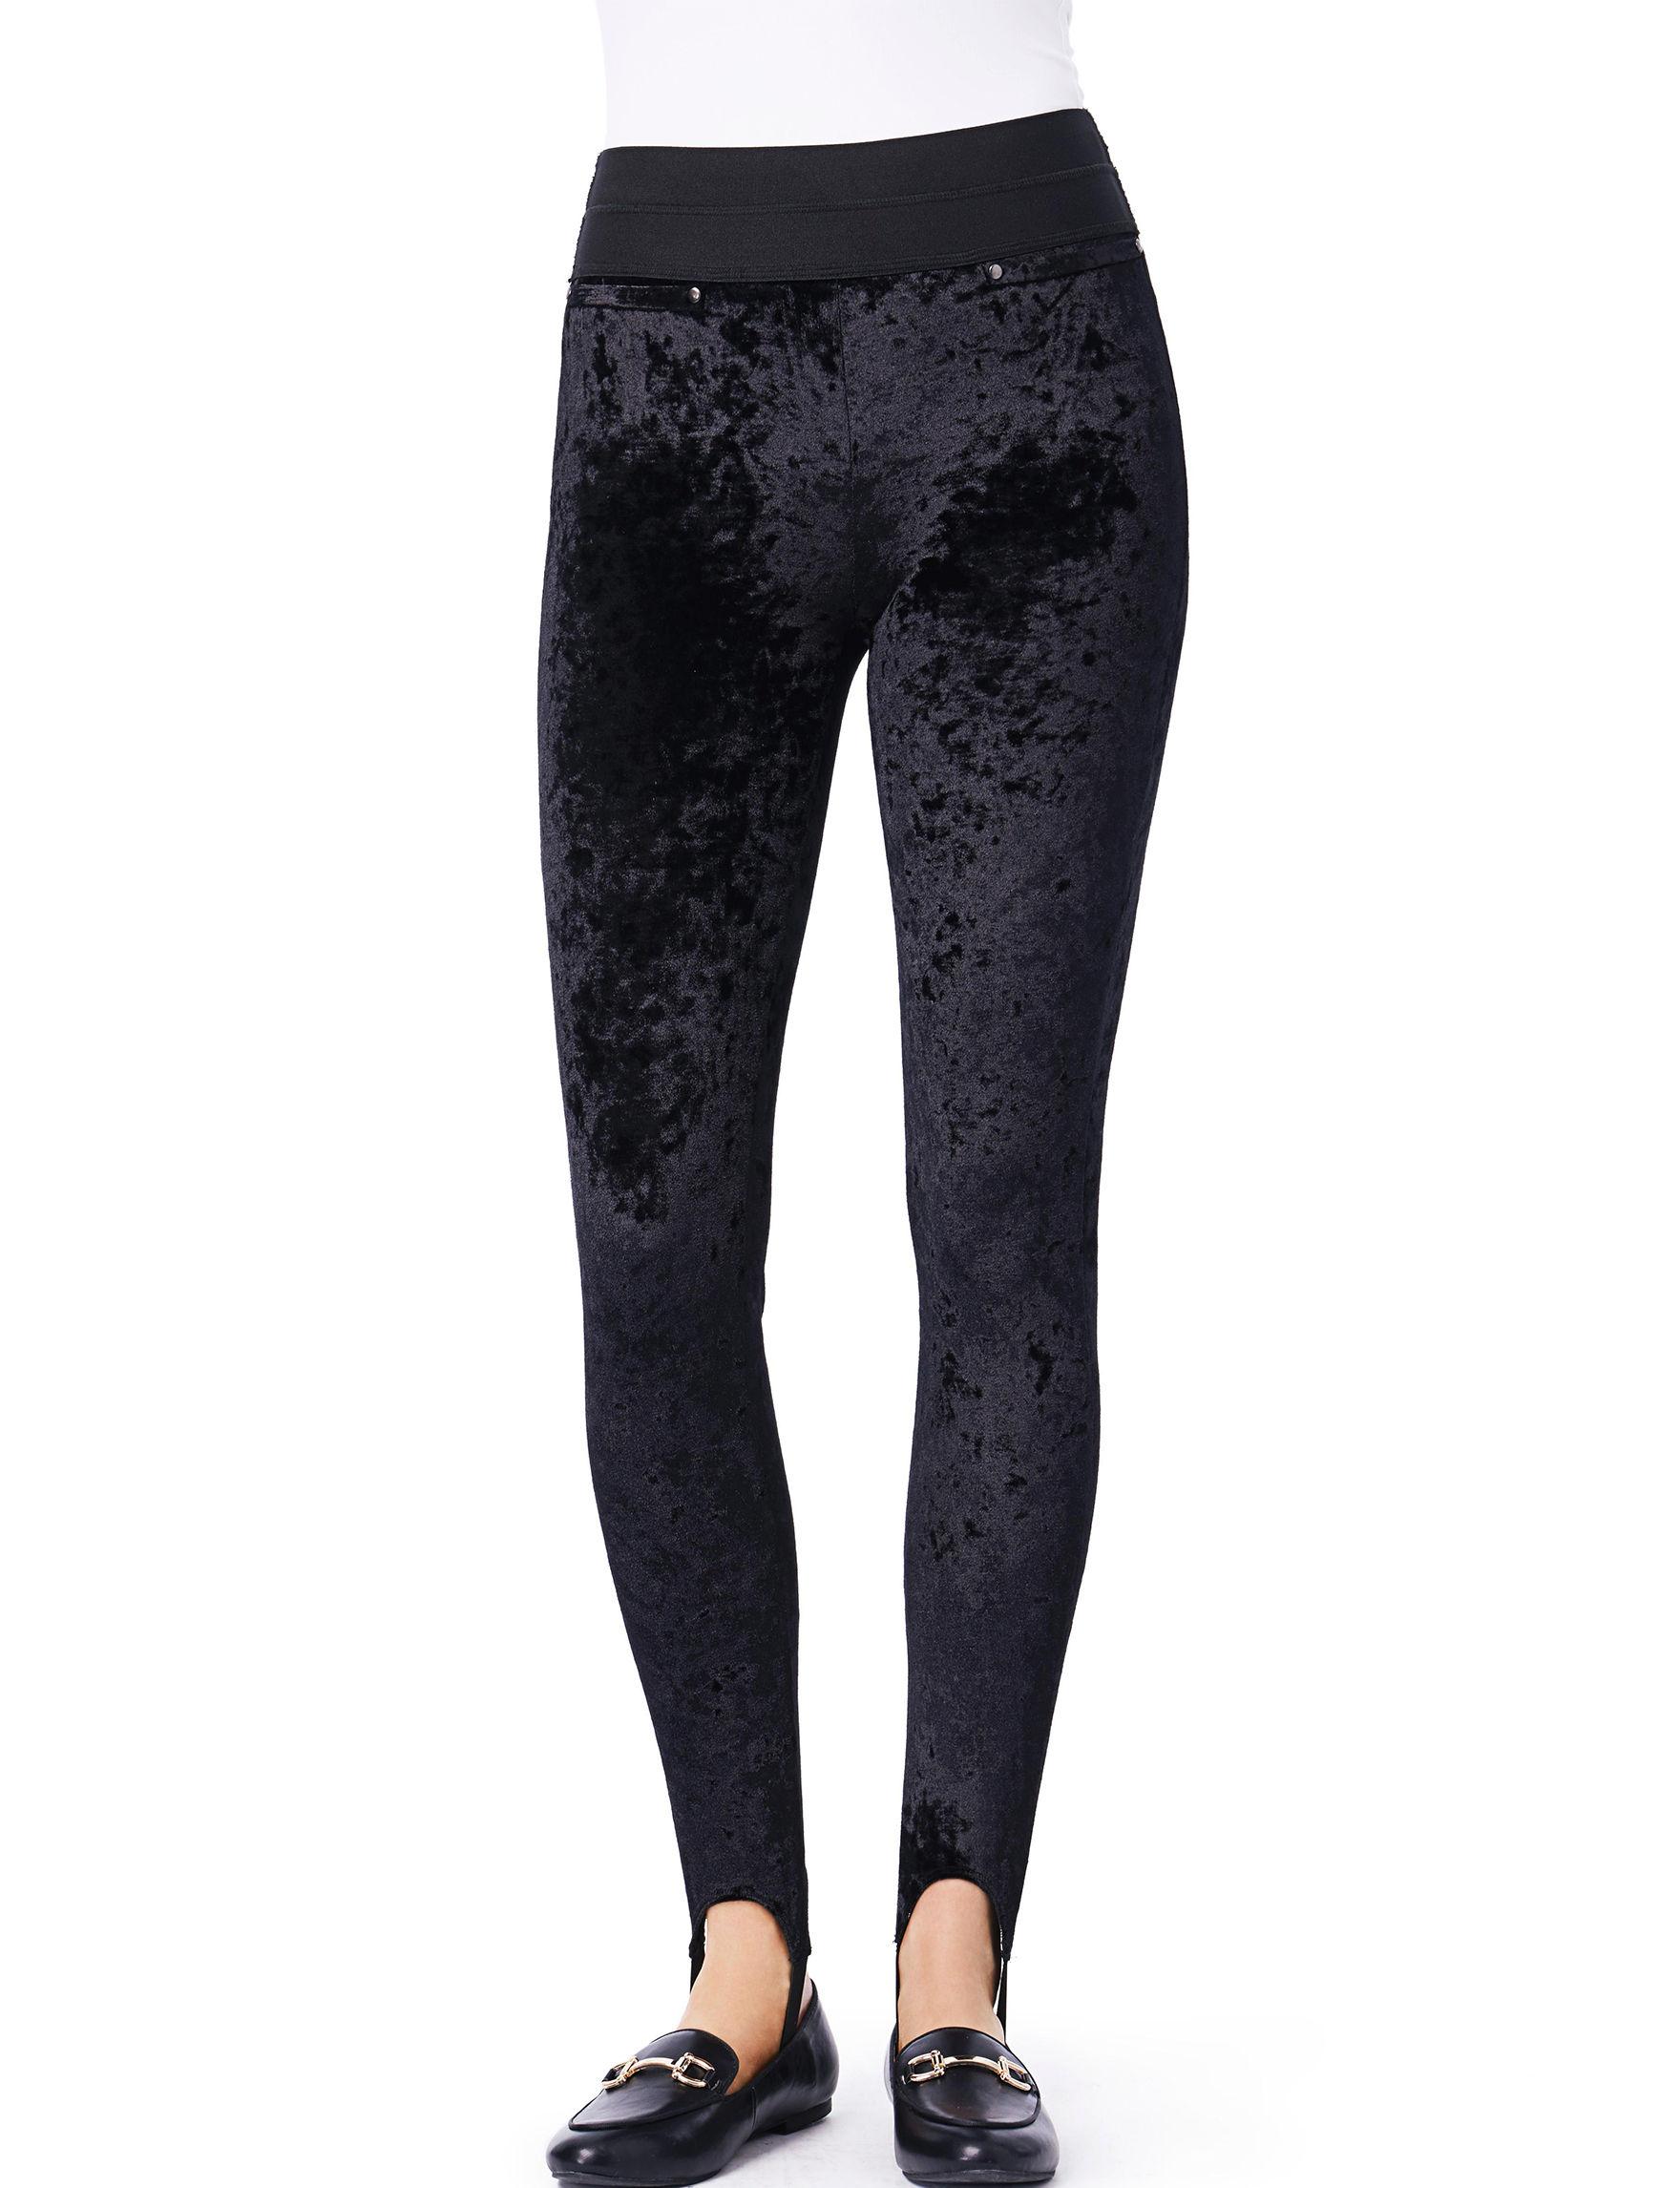 XOXO Black Soft Pants